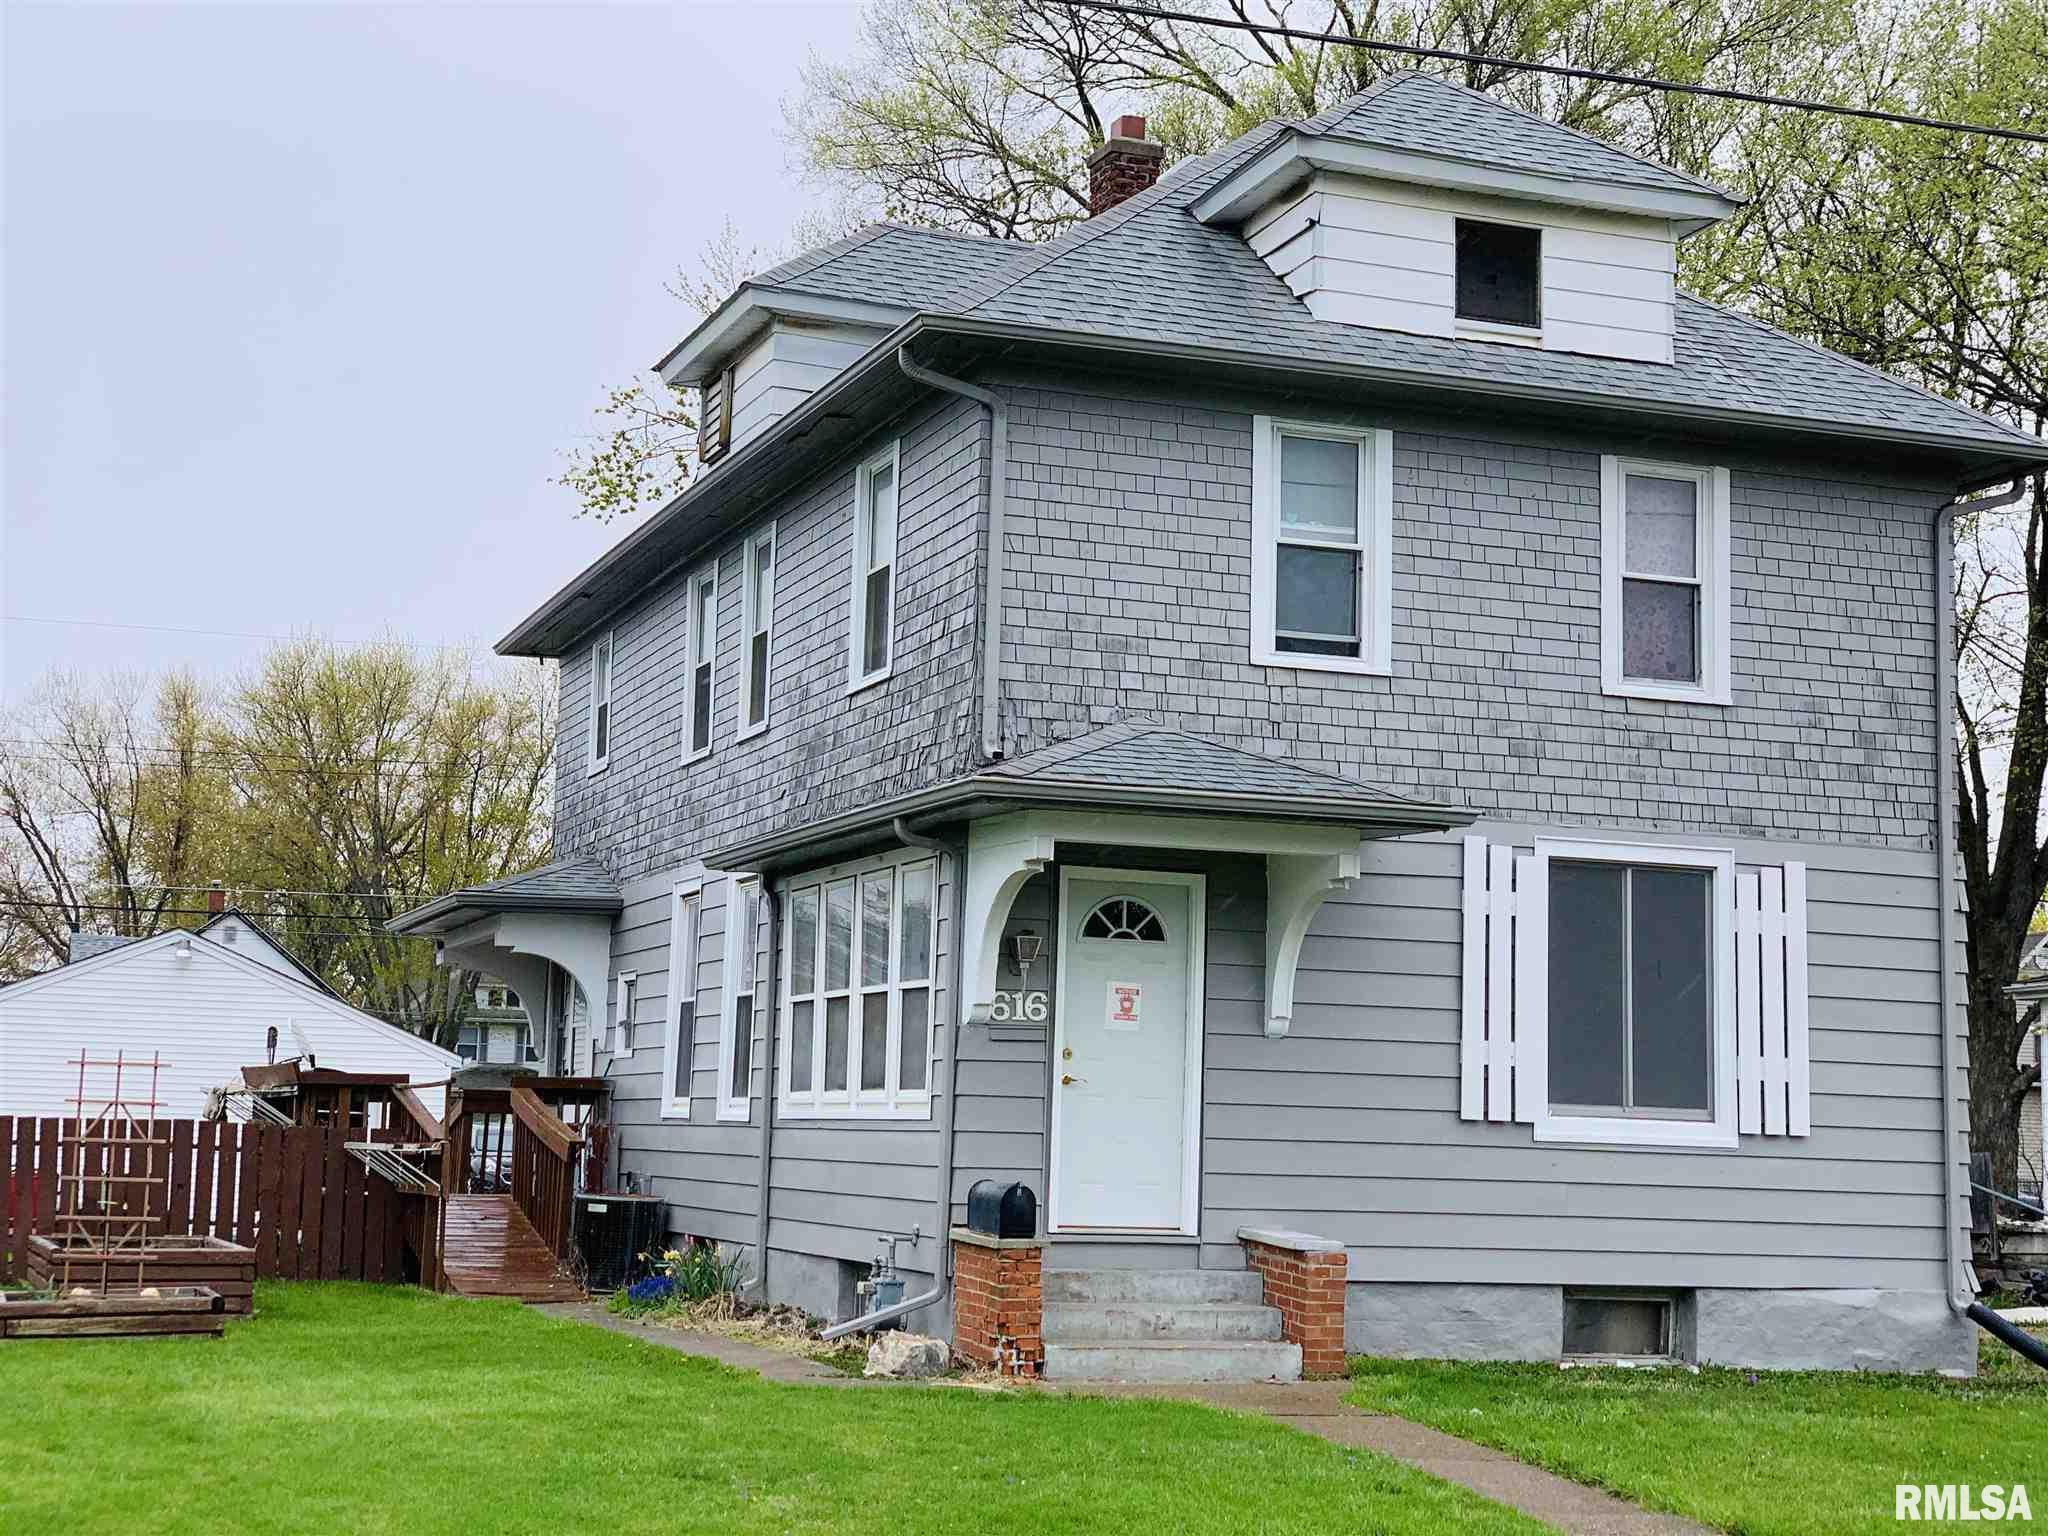 616 S CLARK Property Photo - Davenport, IA real estate listing